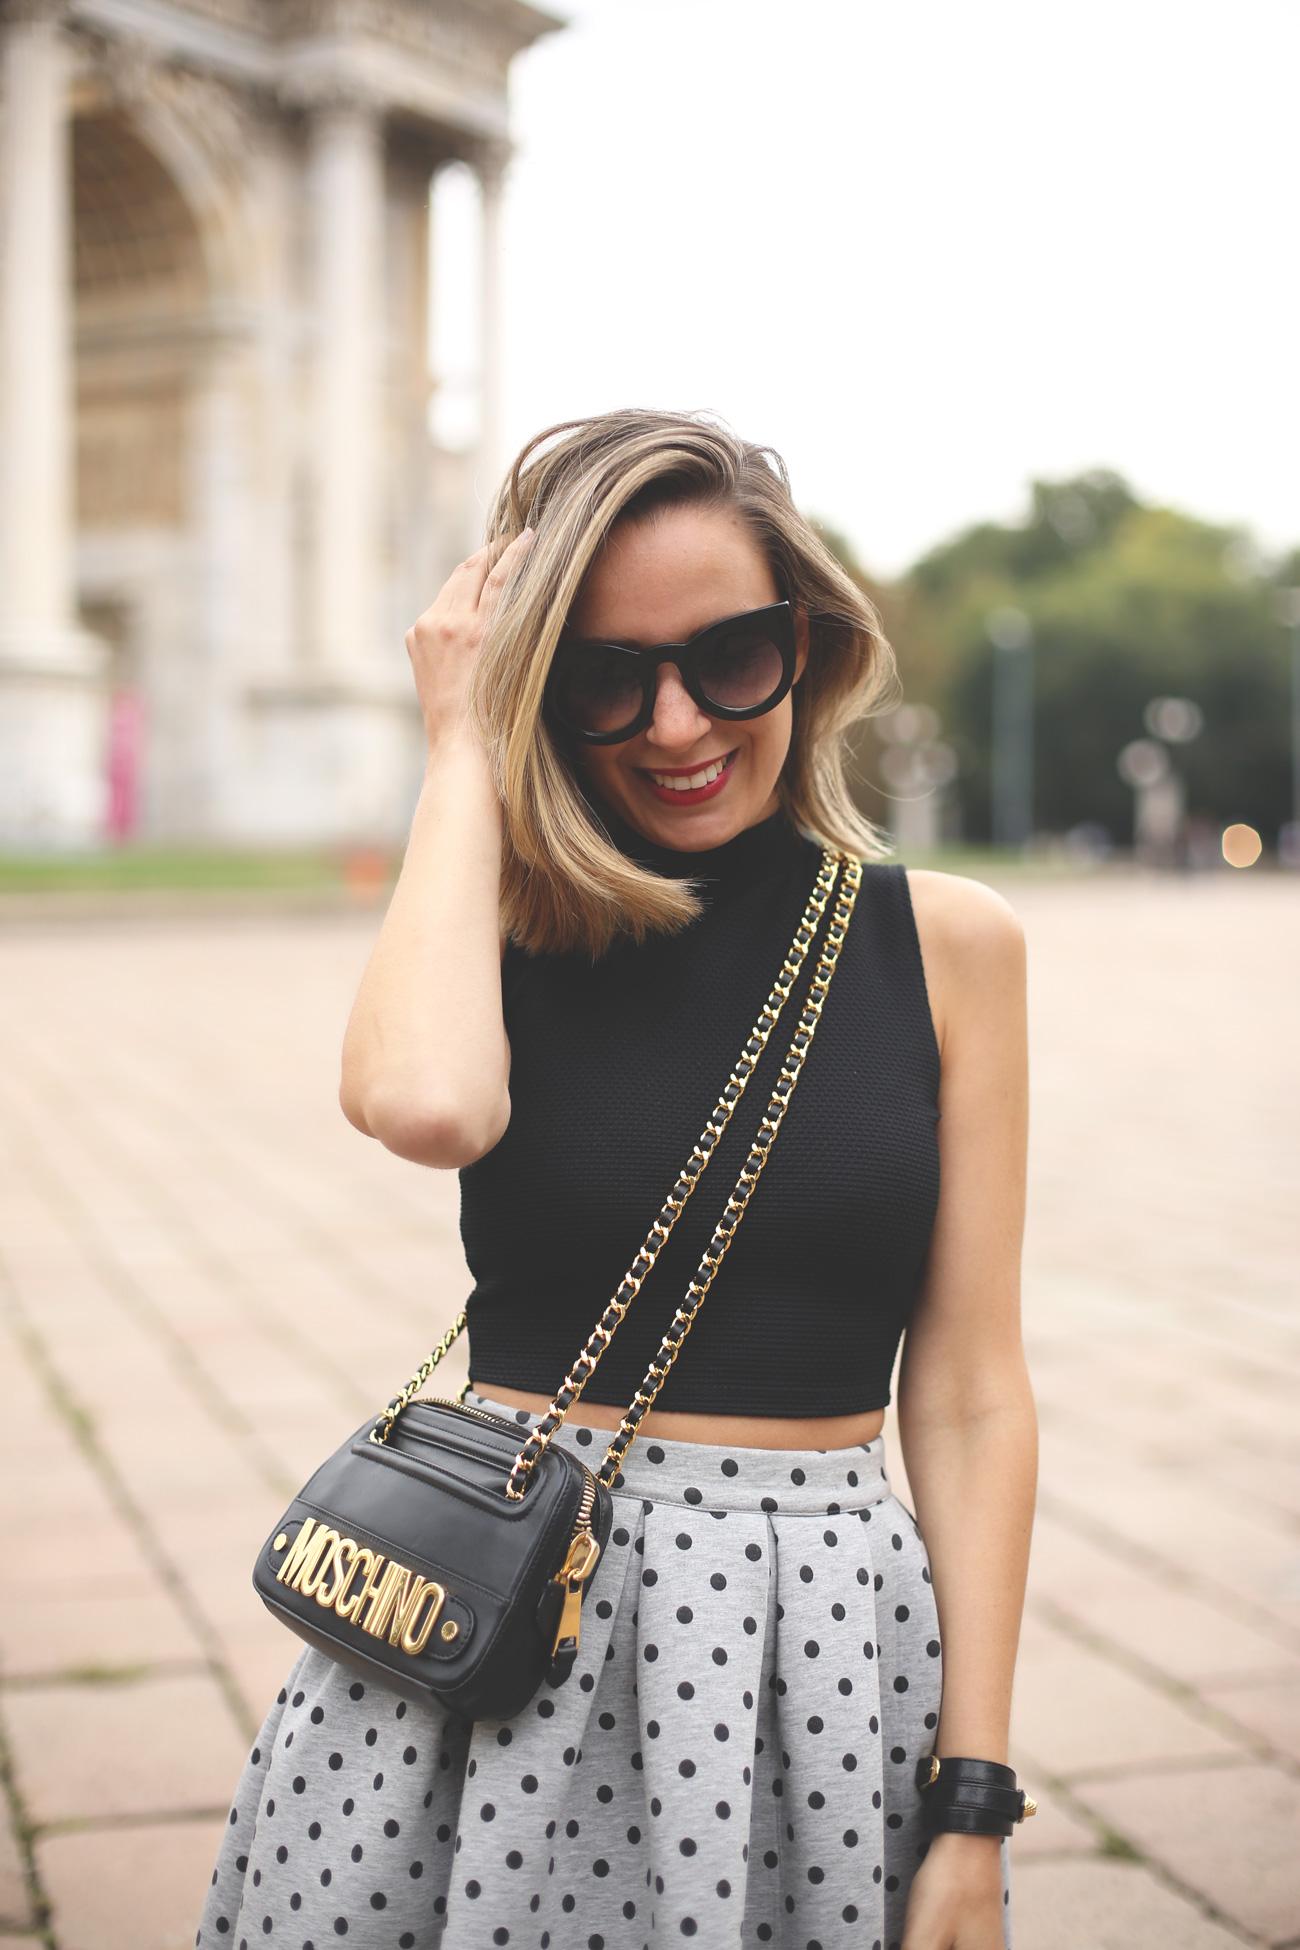 falda midi, look mfw, street style Milano, mfw 2014, blog de moda, fashion blogger, life style blog, zapatos rojos, bolso moschino,